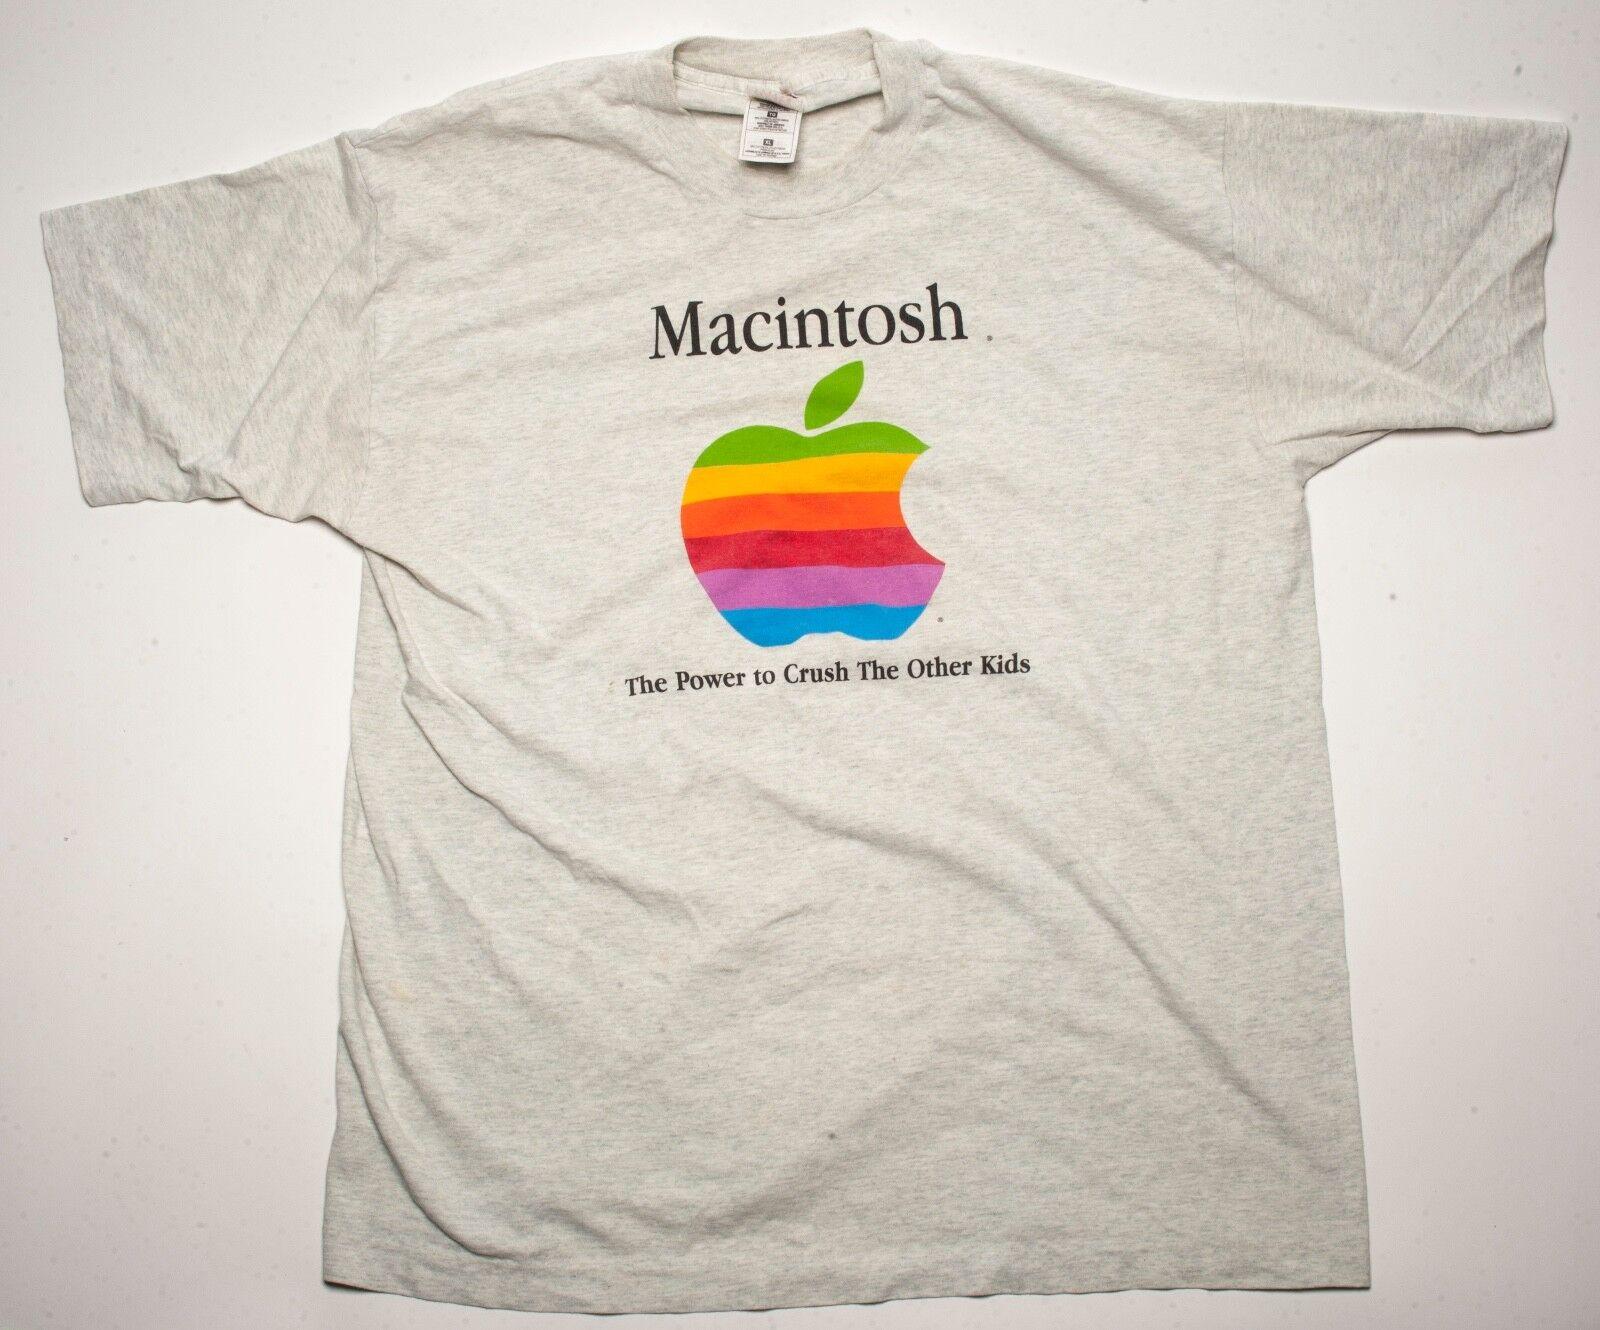 Original 1996 Macintosh Apple Logo T-Shirt The Power to Crush the Other Kids XL